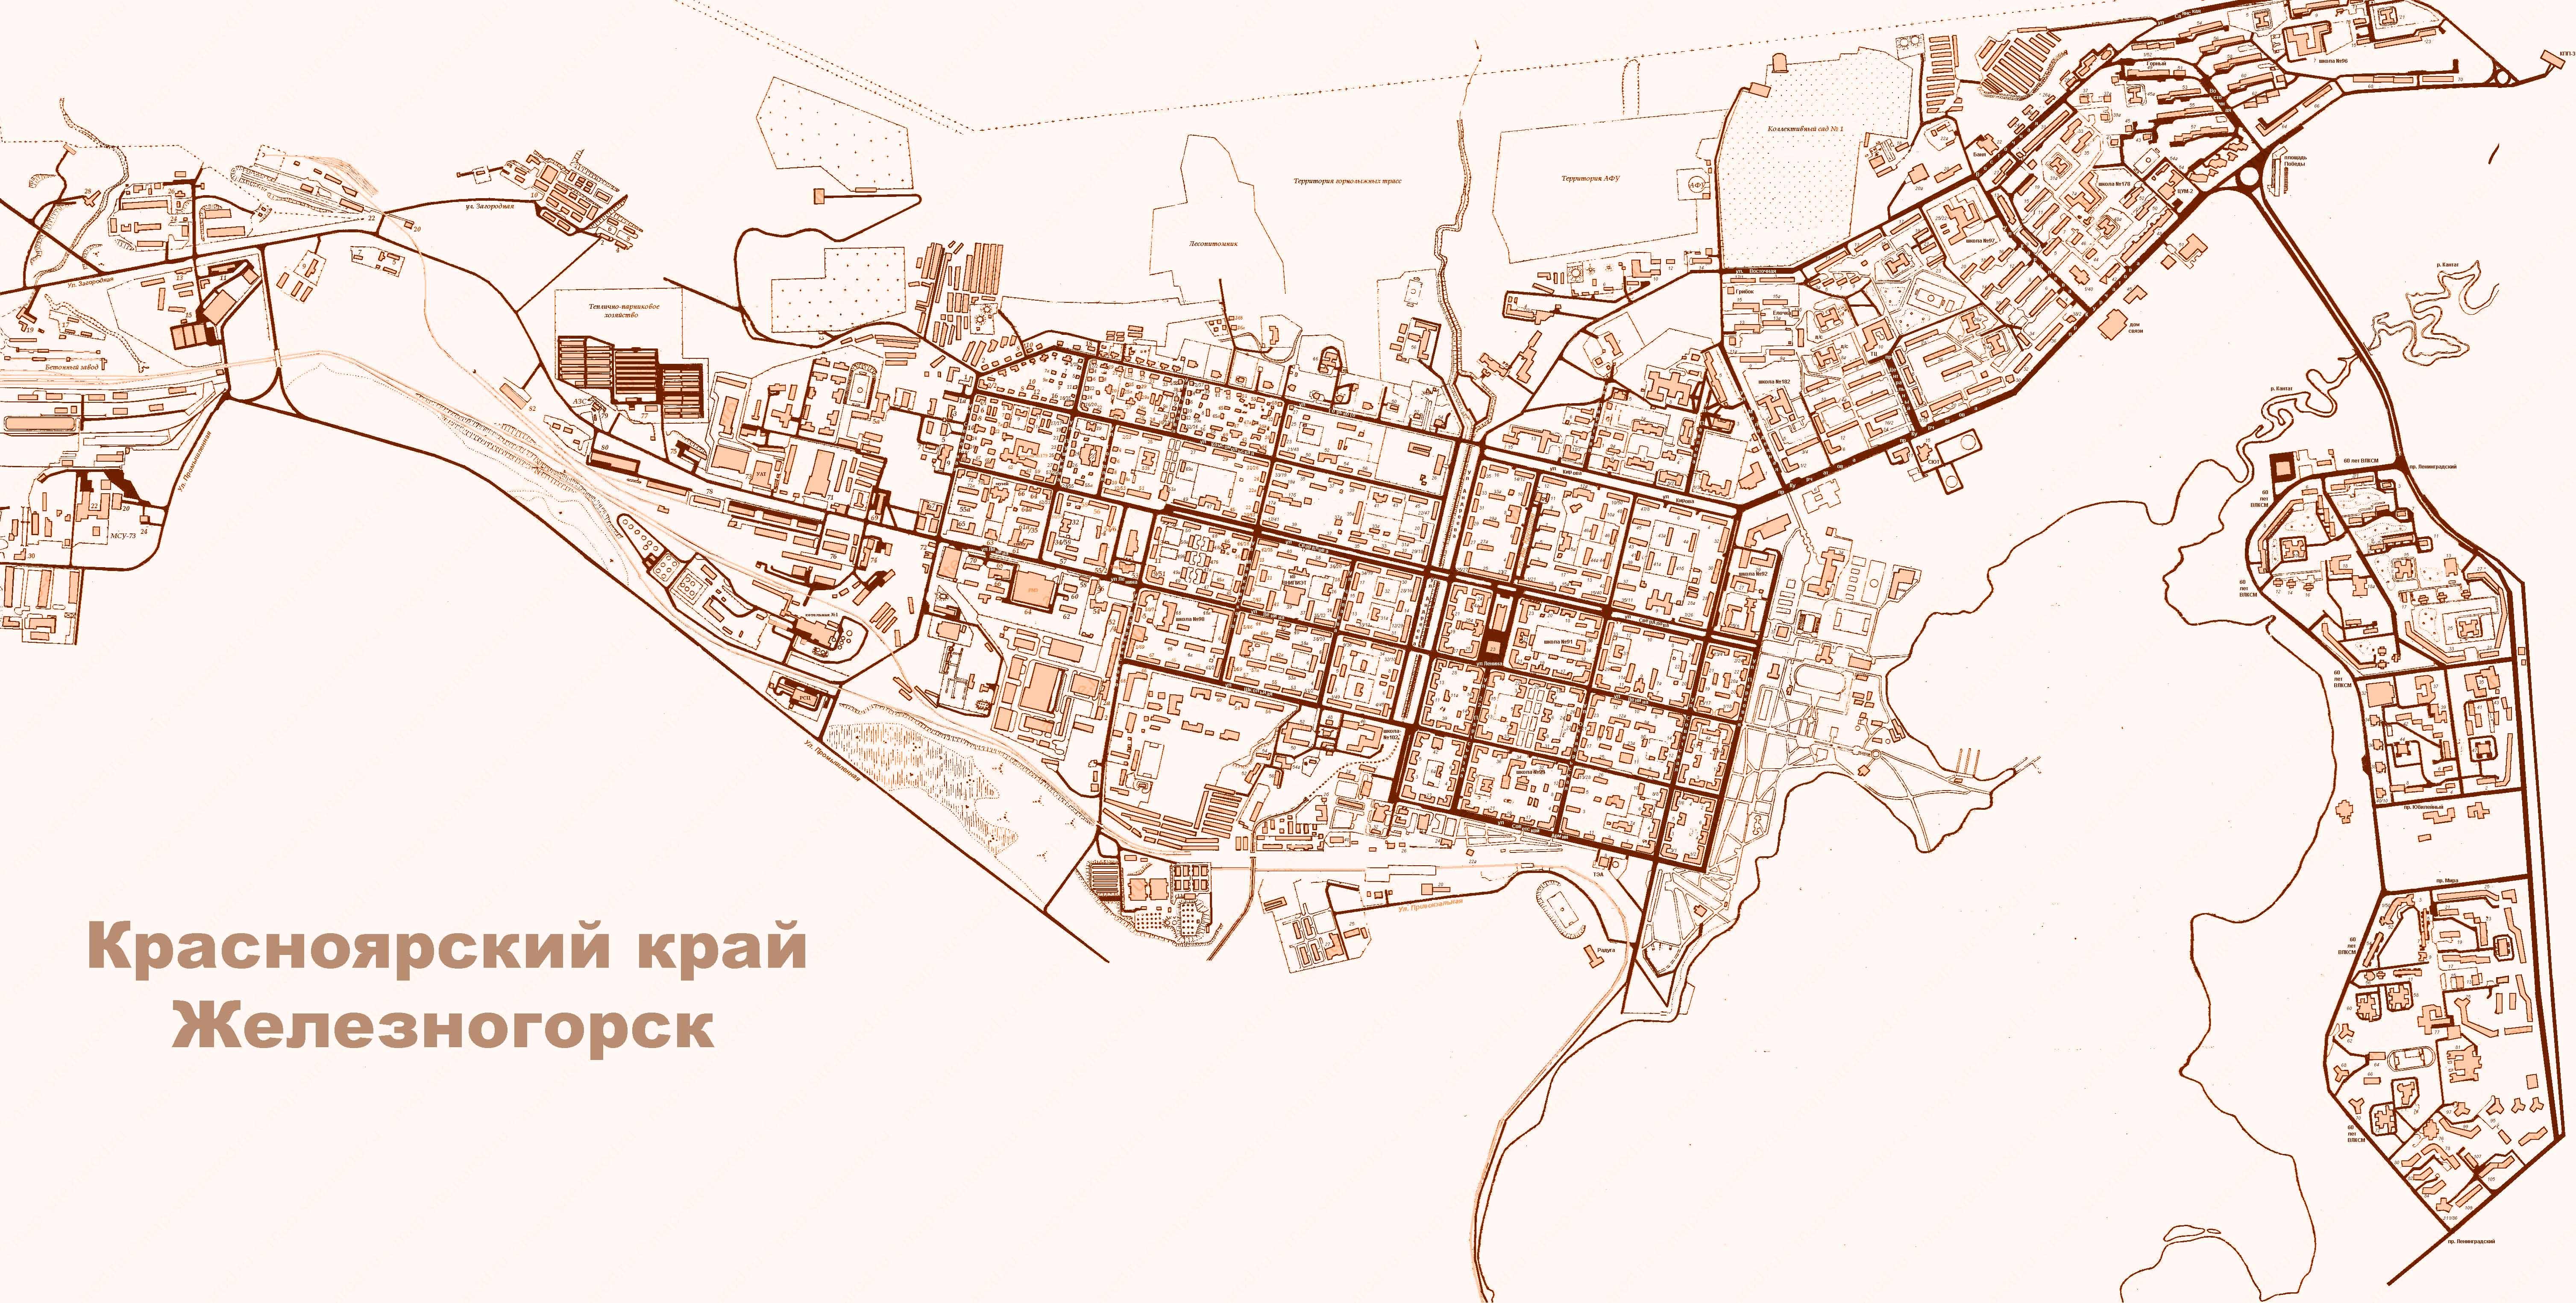 Карта города железногорск с улицами